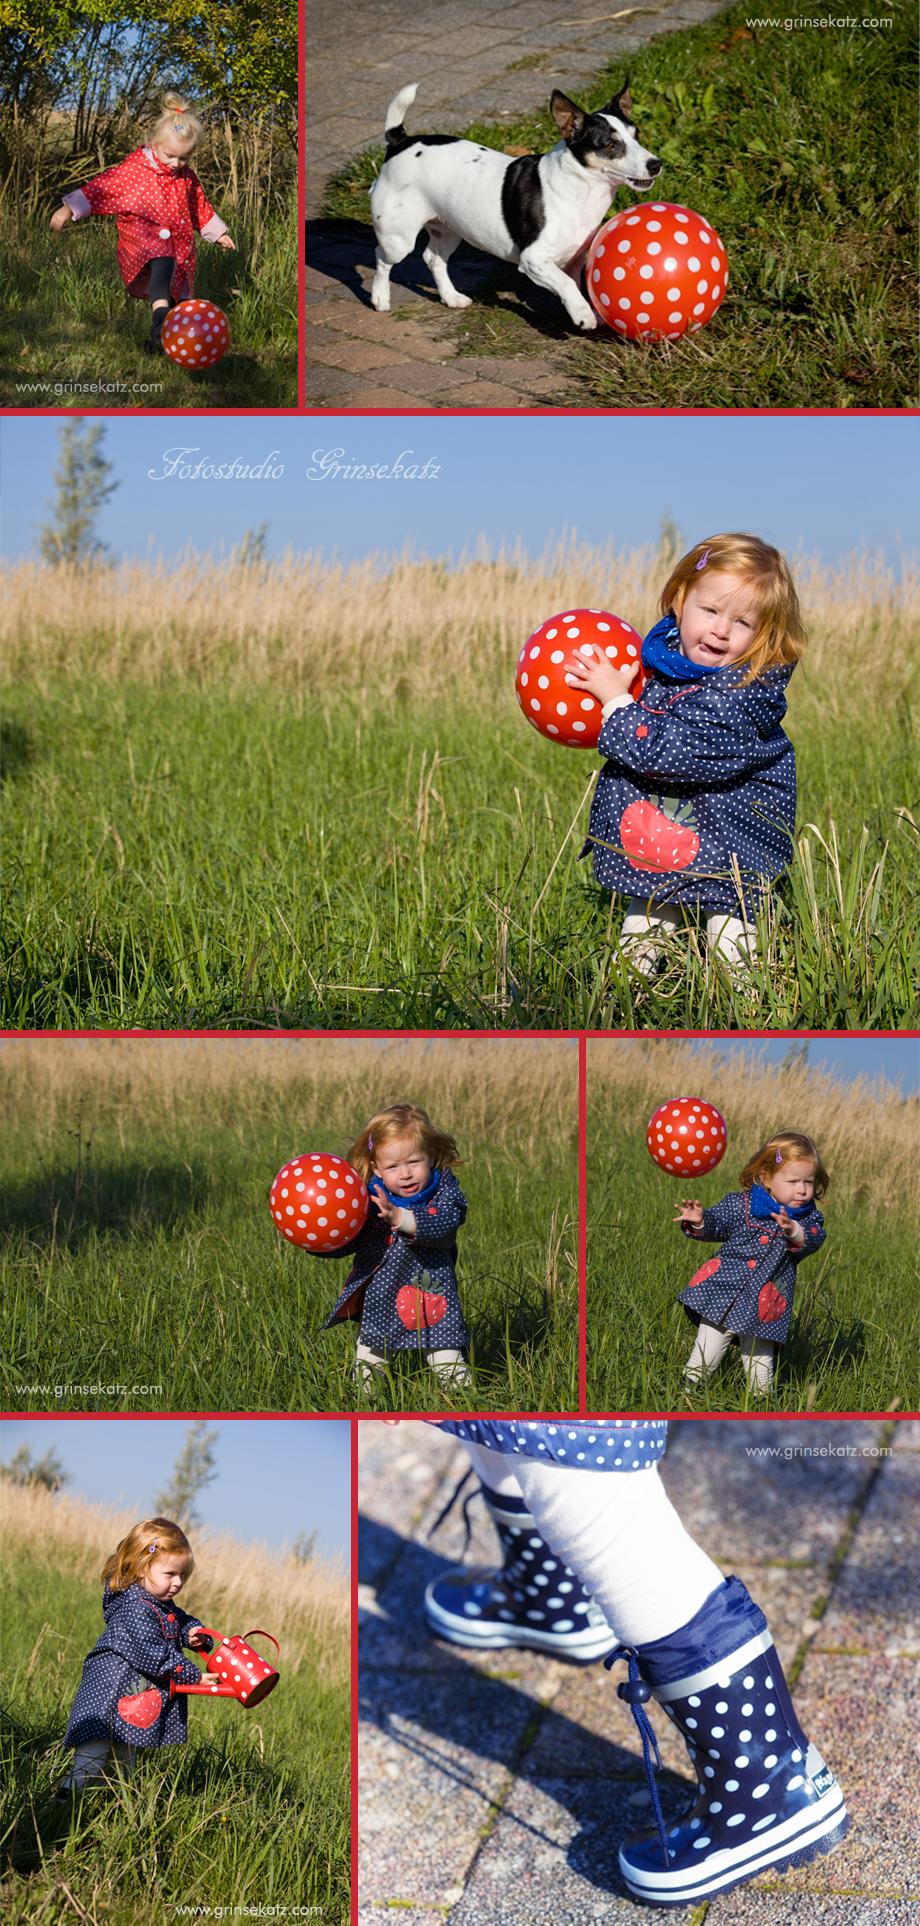 styled-shooting-polka-dots-grinsekatz